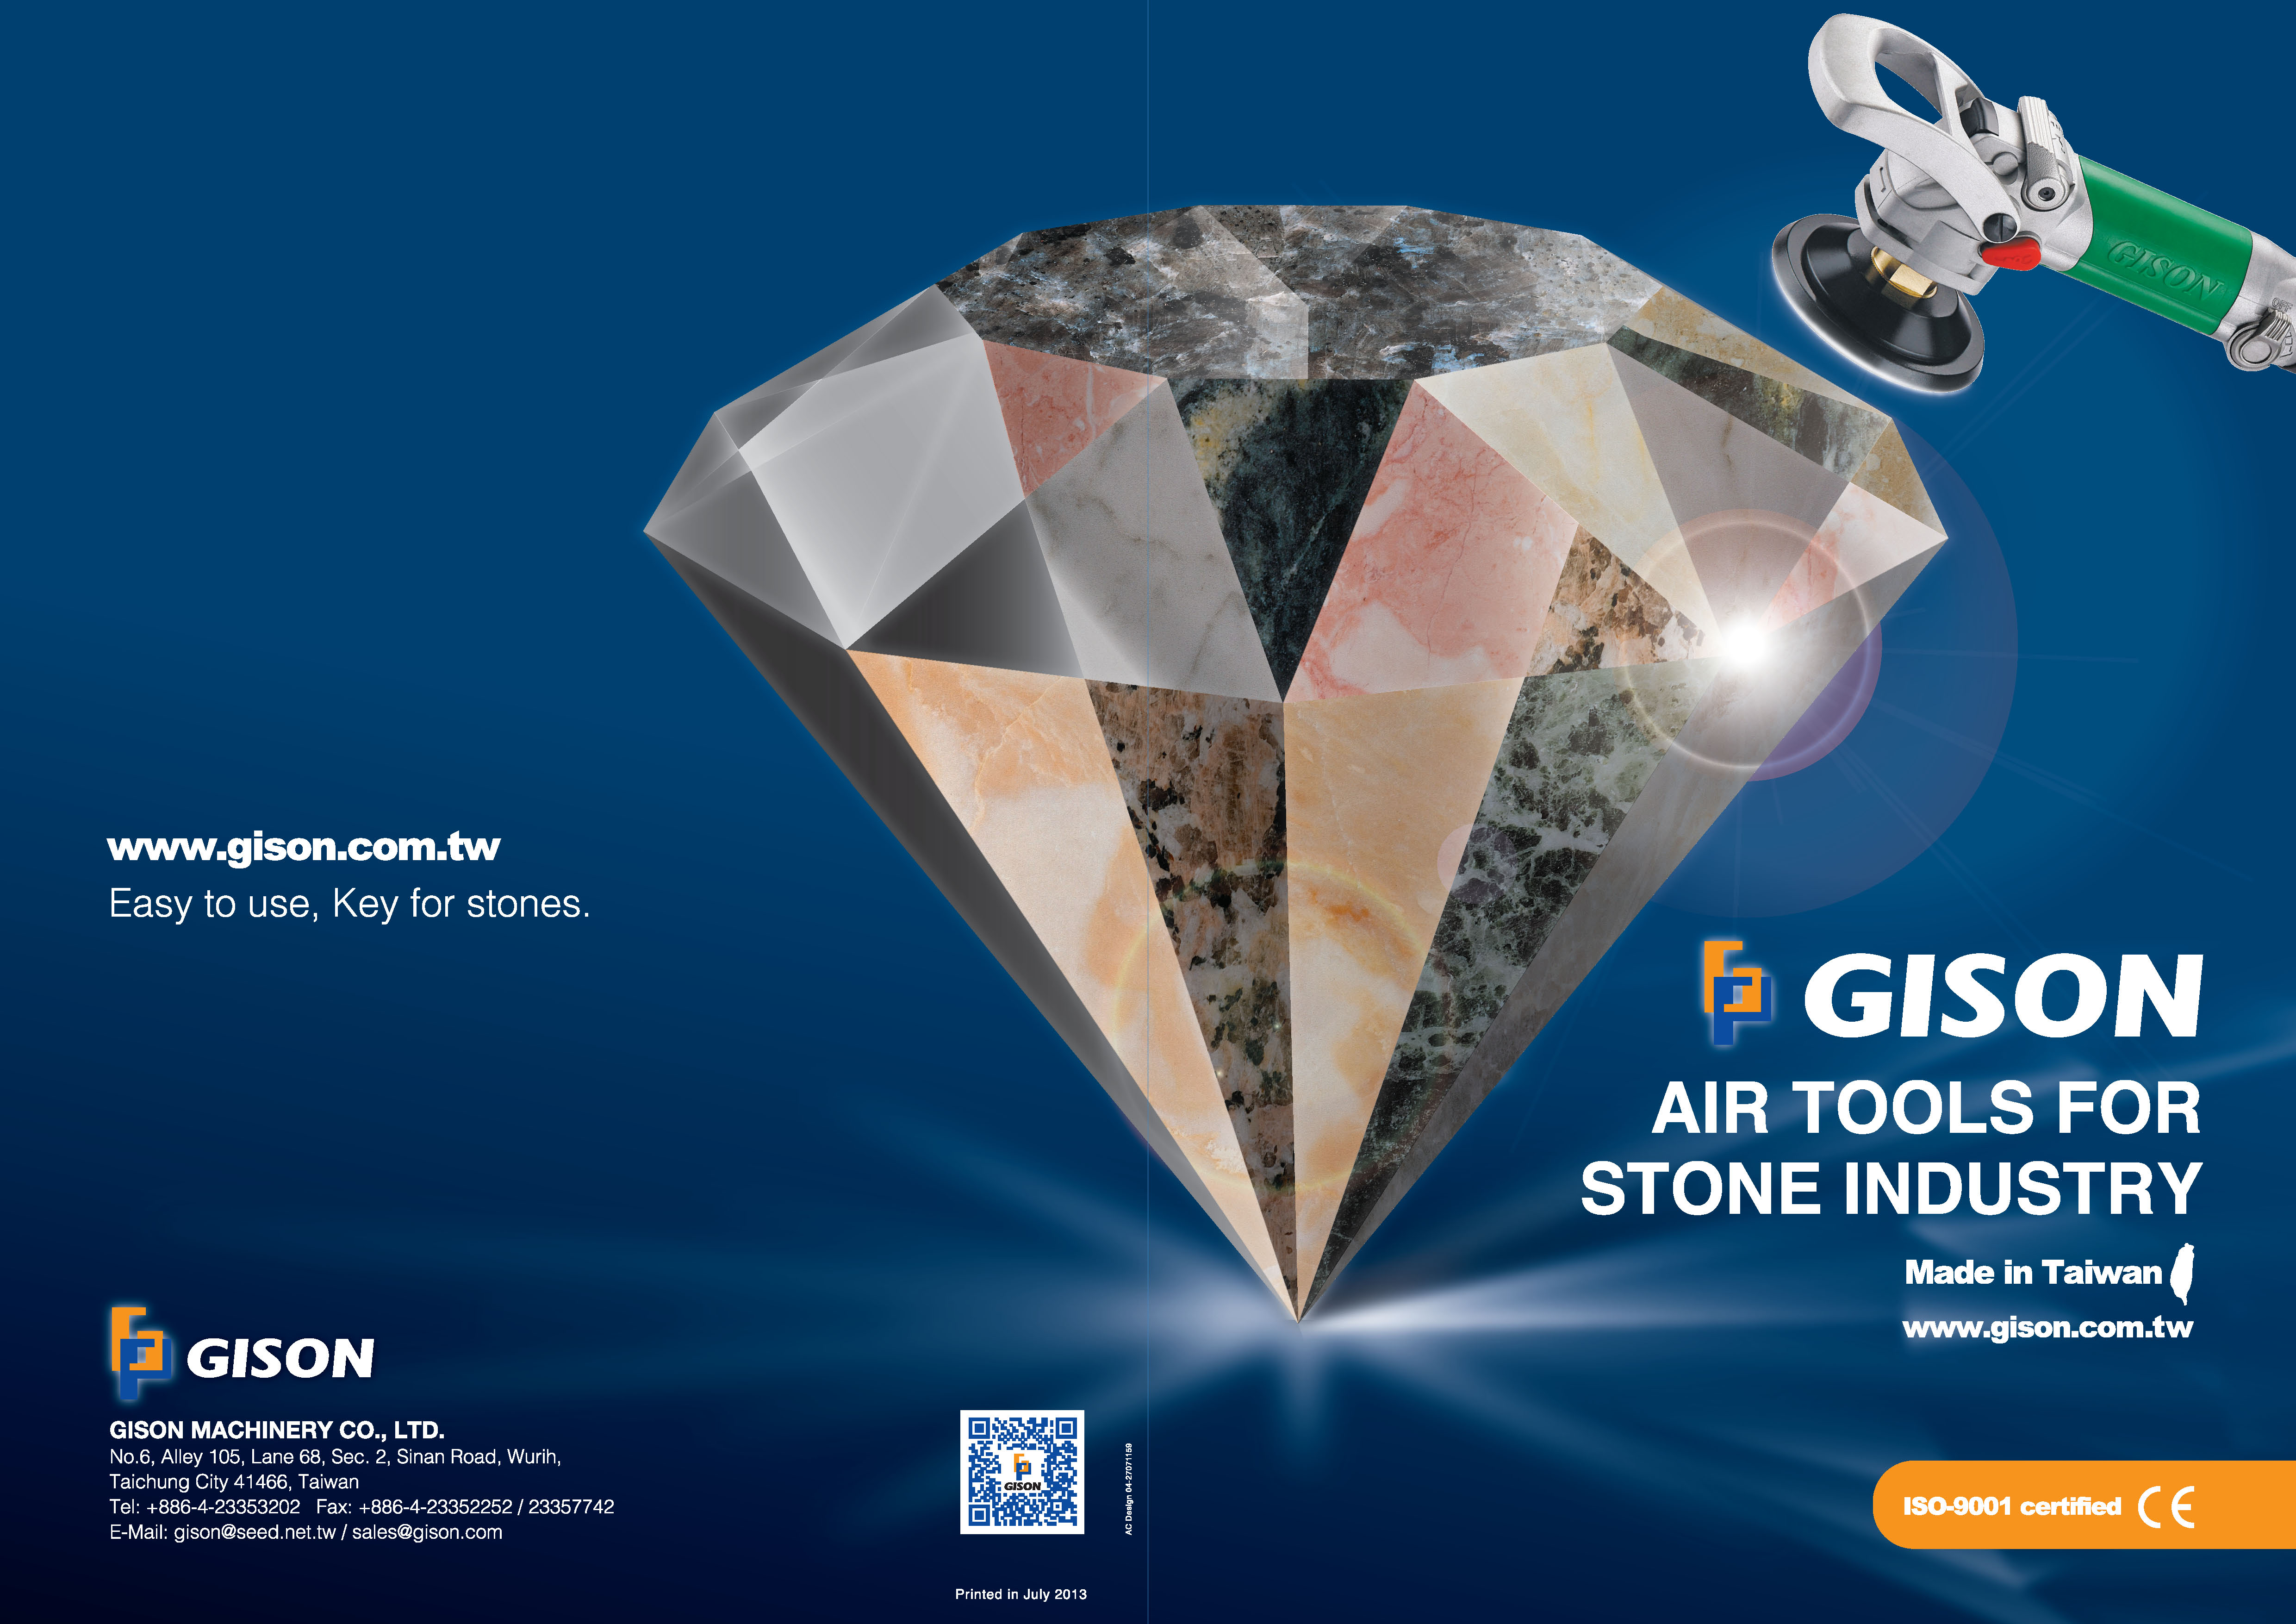 2013-2014 GISON أدوات الهواء الرطب لكتالوج الحجر والرخام والجرانيت - 2013-2014 GISON أدوات الهواء الرطب للحجر والرخام والجرانيت